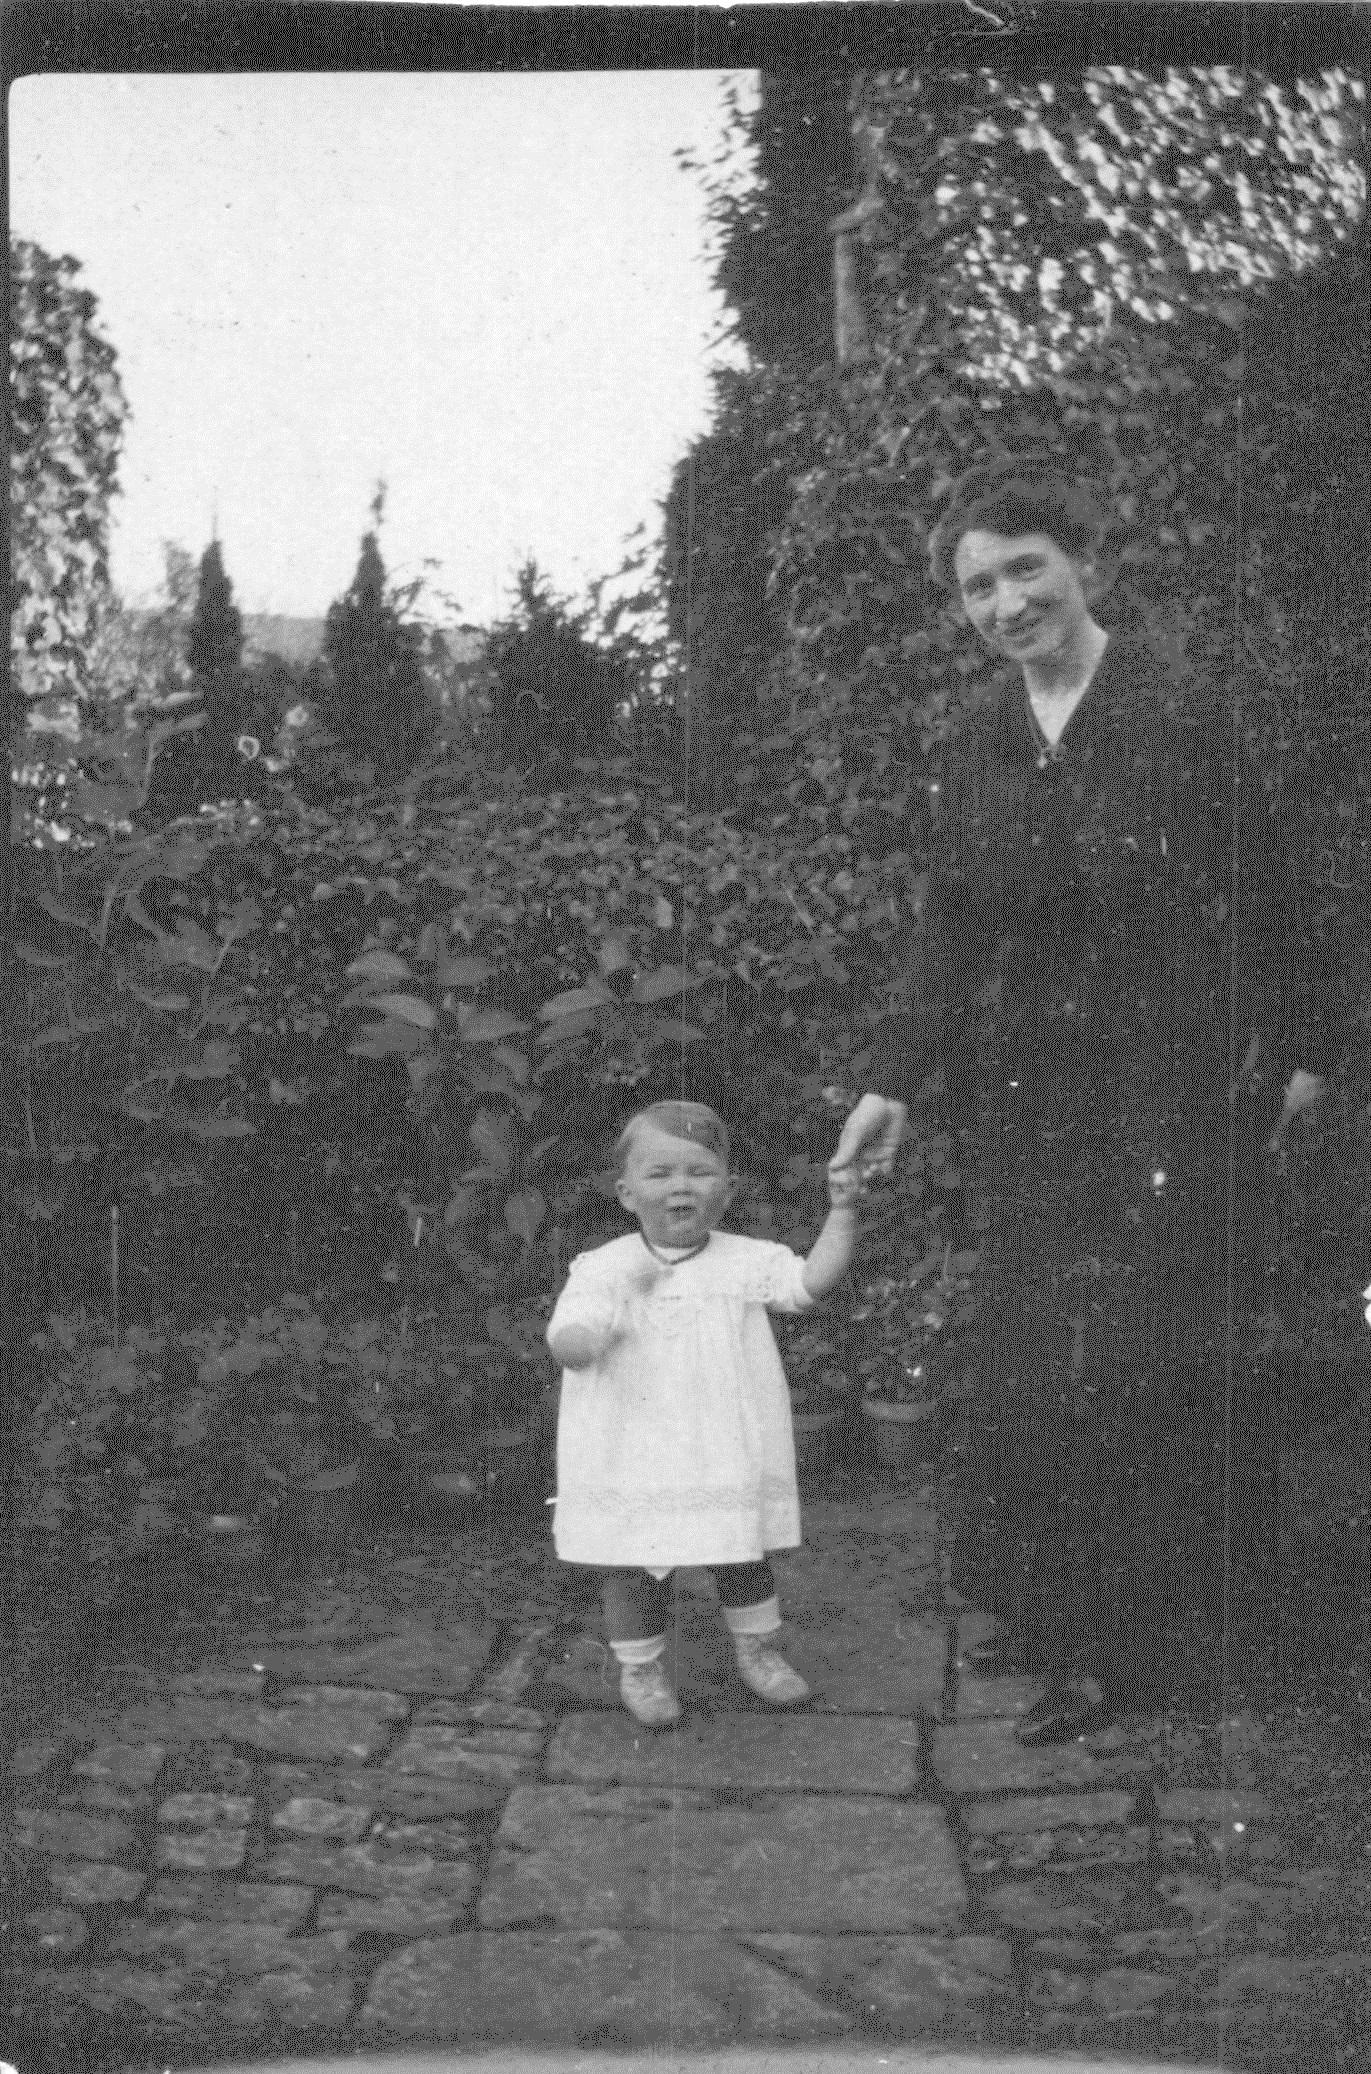 Pierre et sa maman